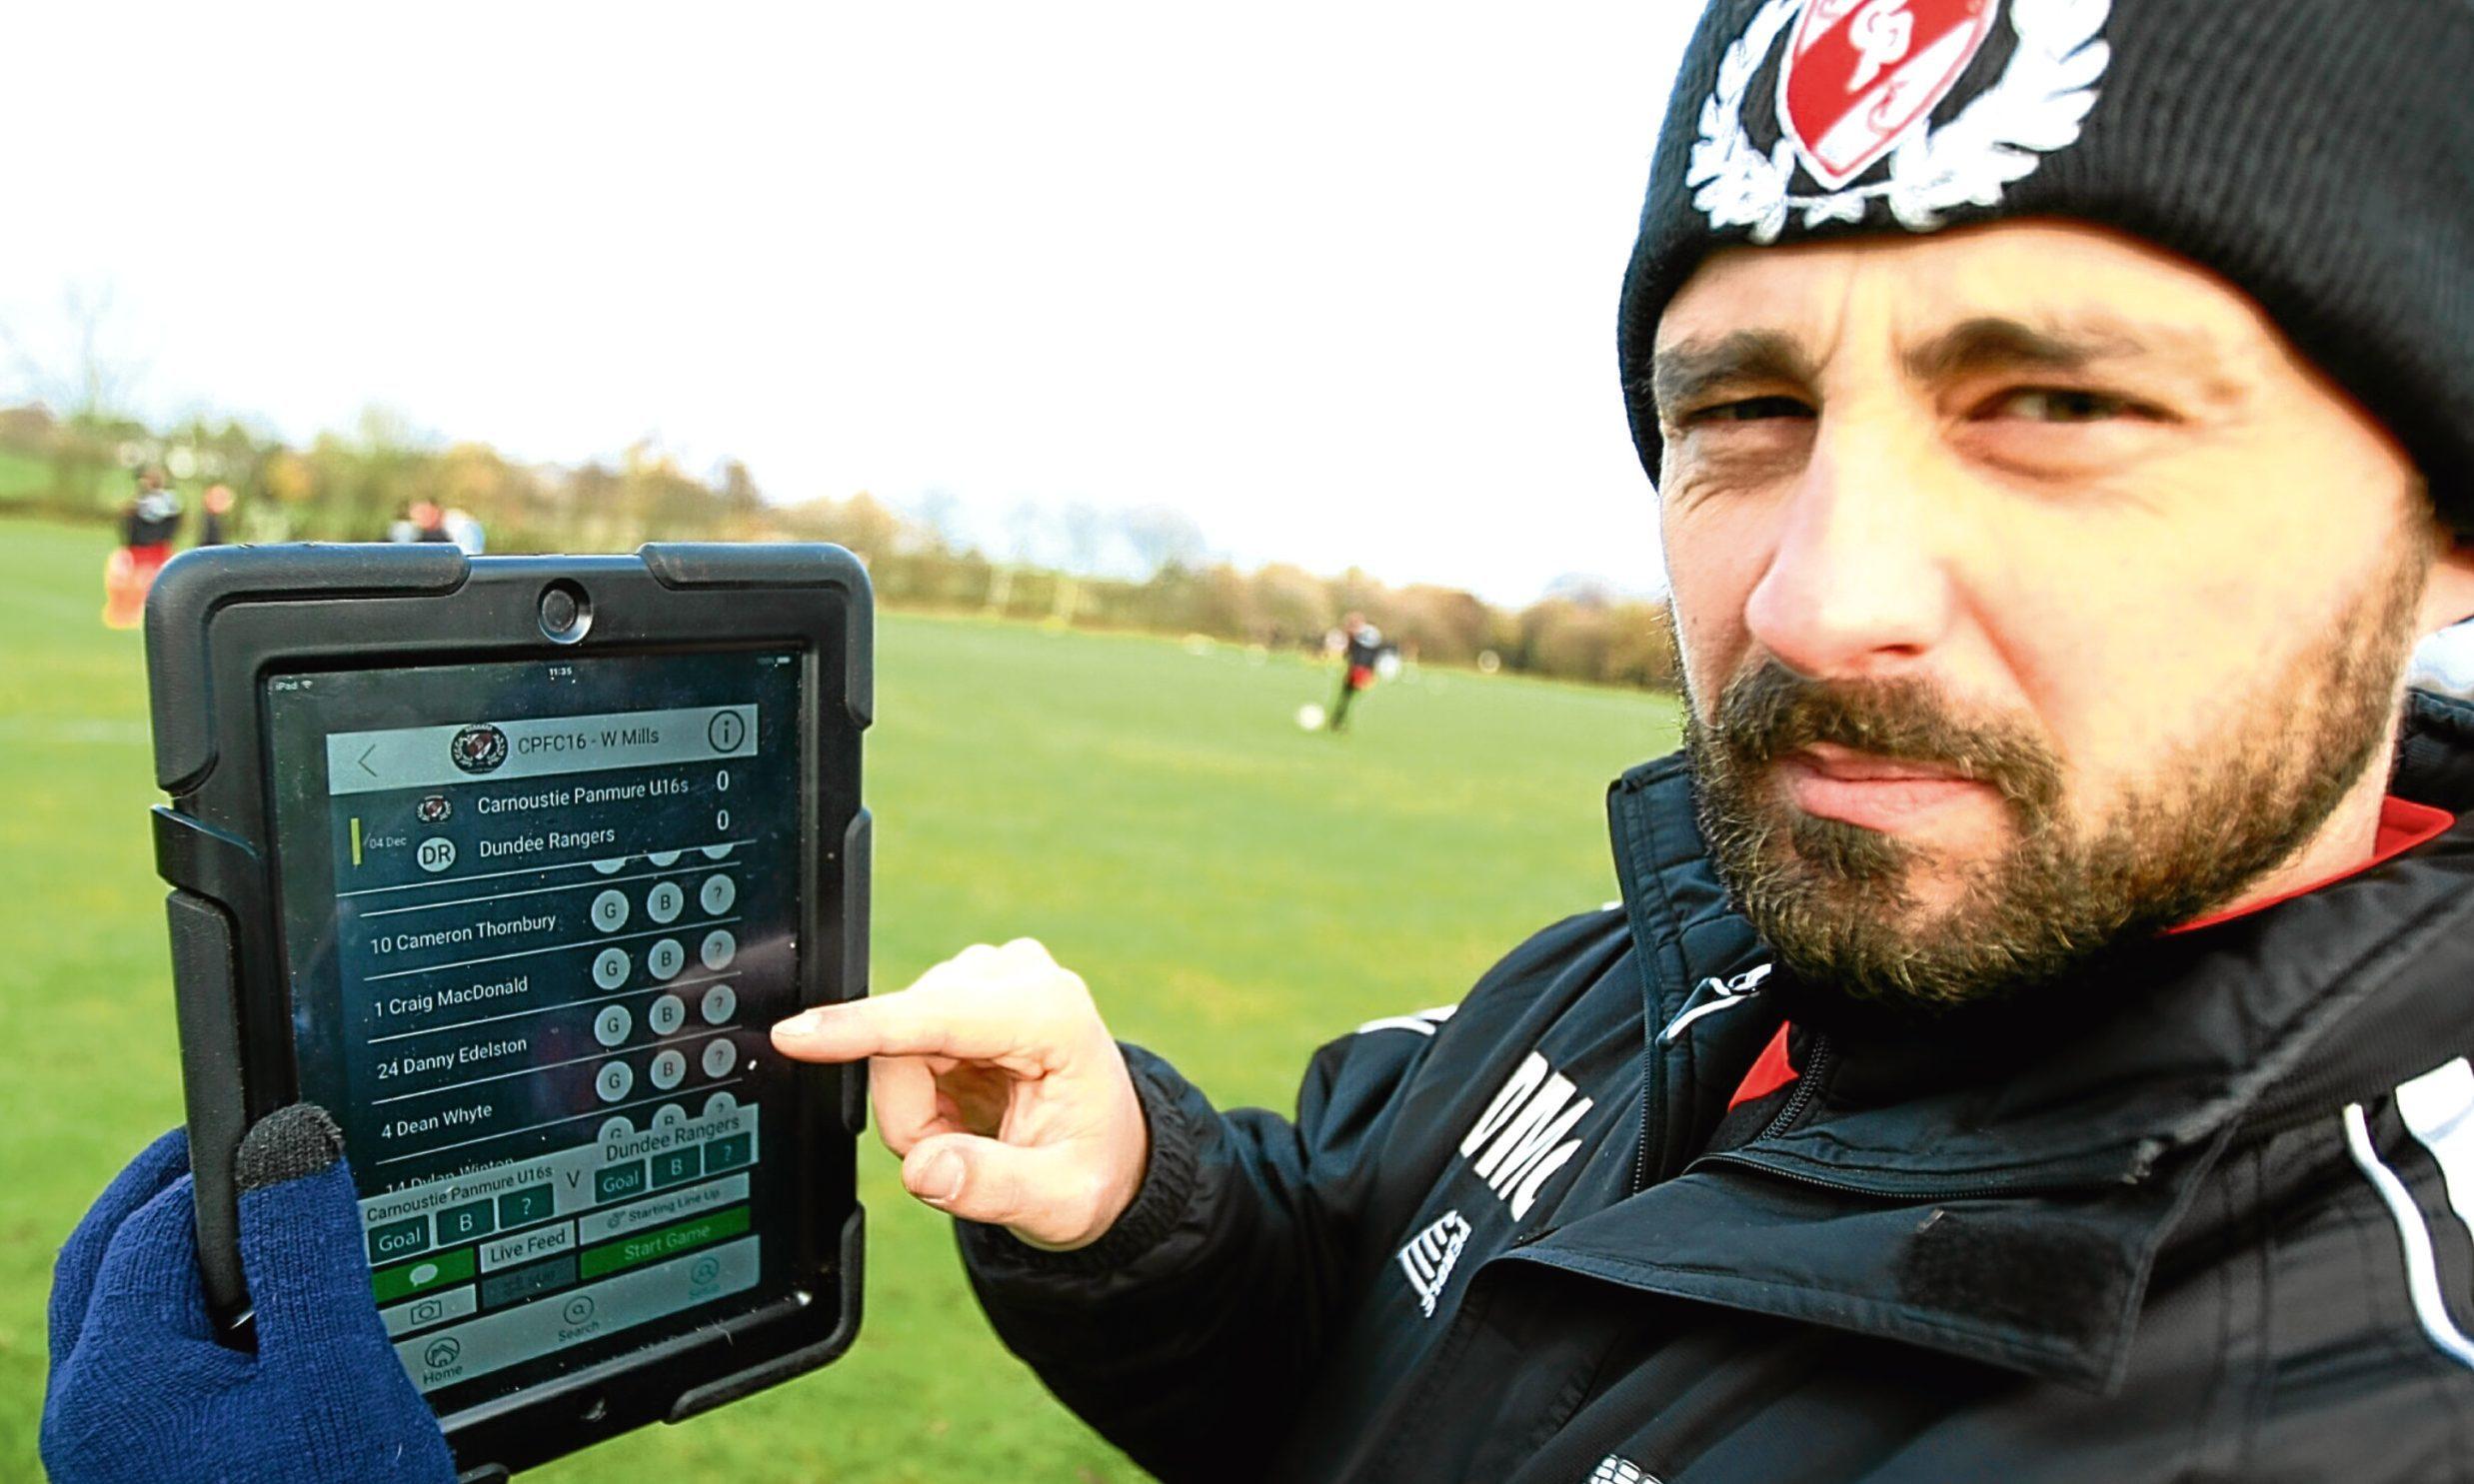 Dean McConnachie with the Usqor app on his iPad.